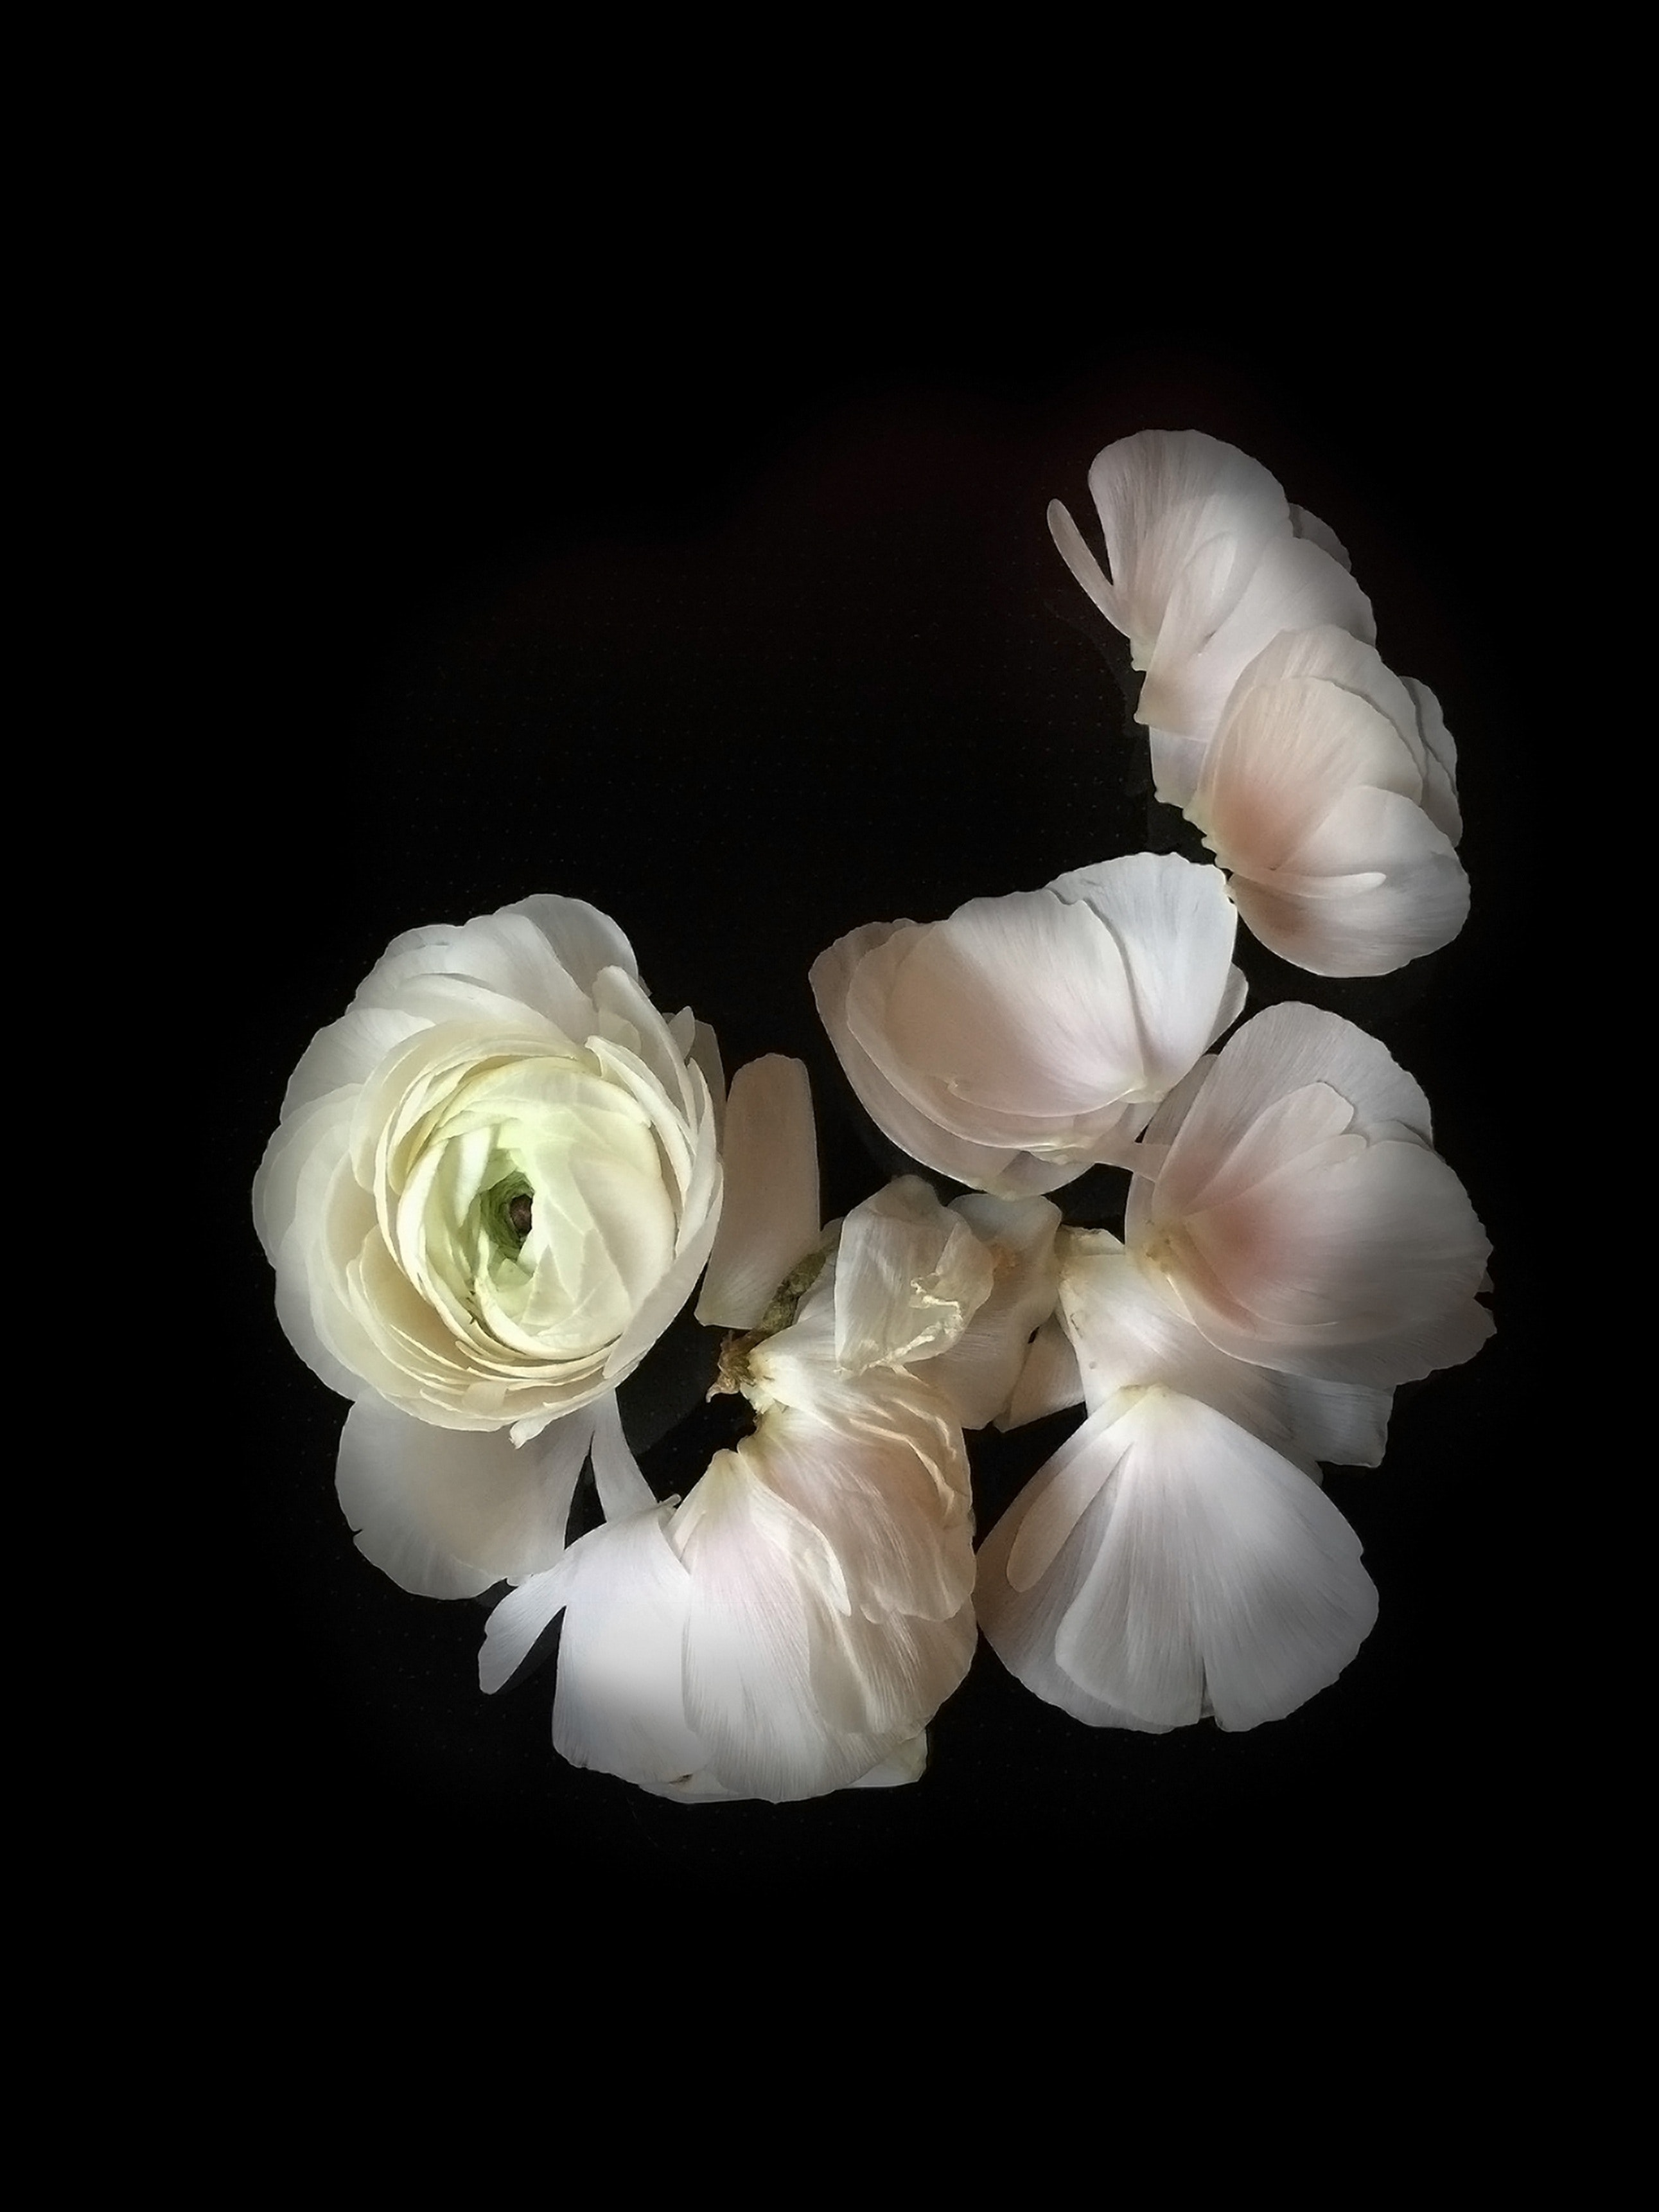 Terkeren 13 Gambar Bunga Background Hitam Gambar Bunga Indah